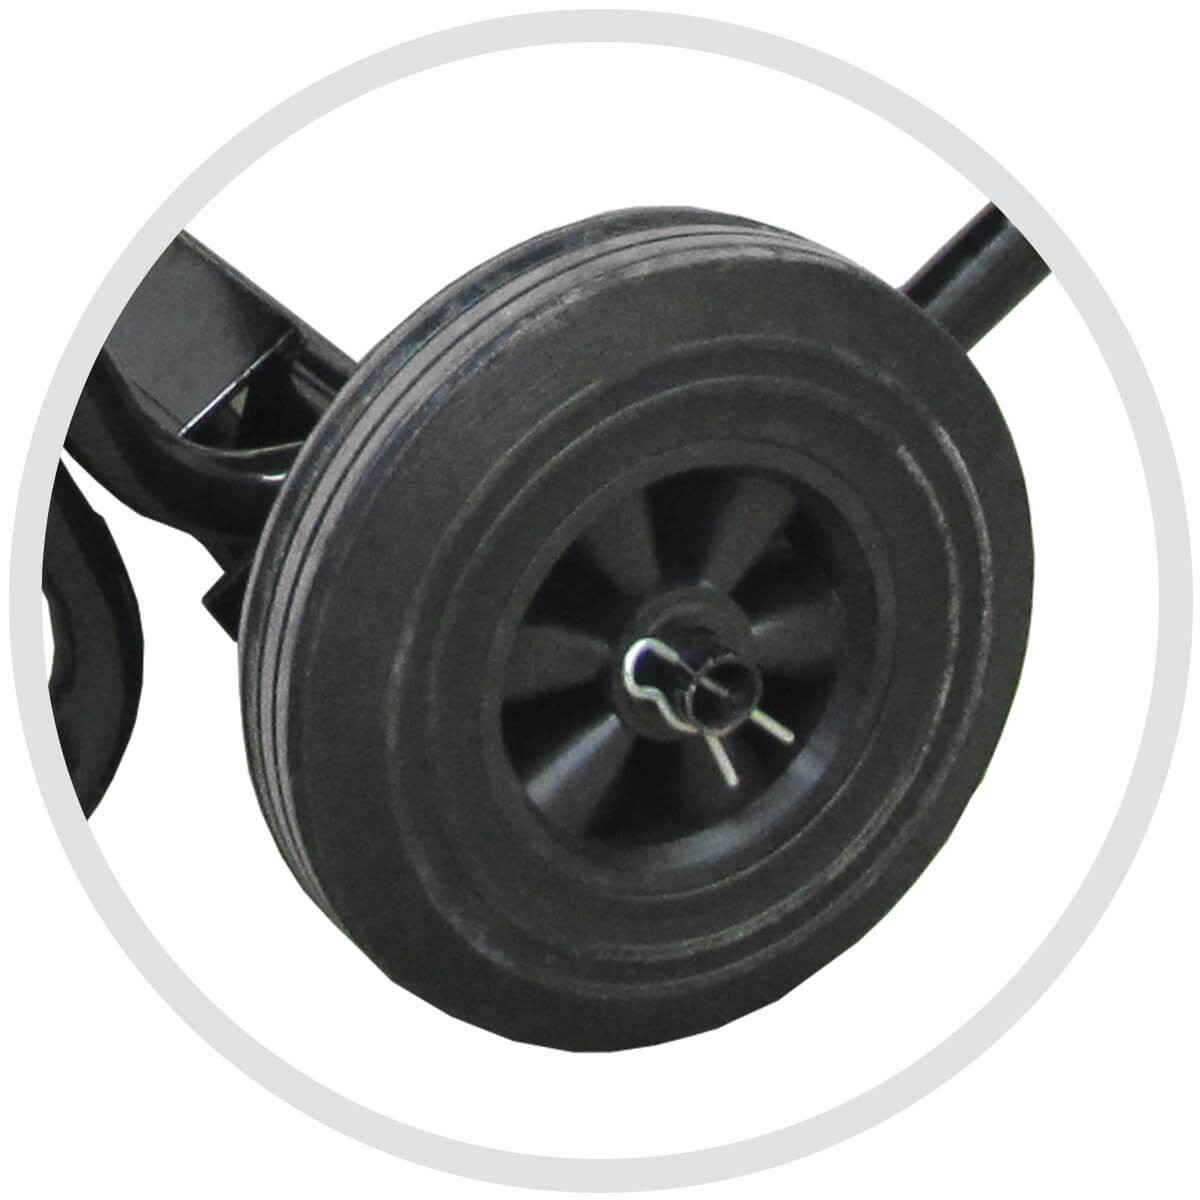 Cleform Gilson Wheelbarrow Mixer